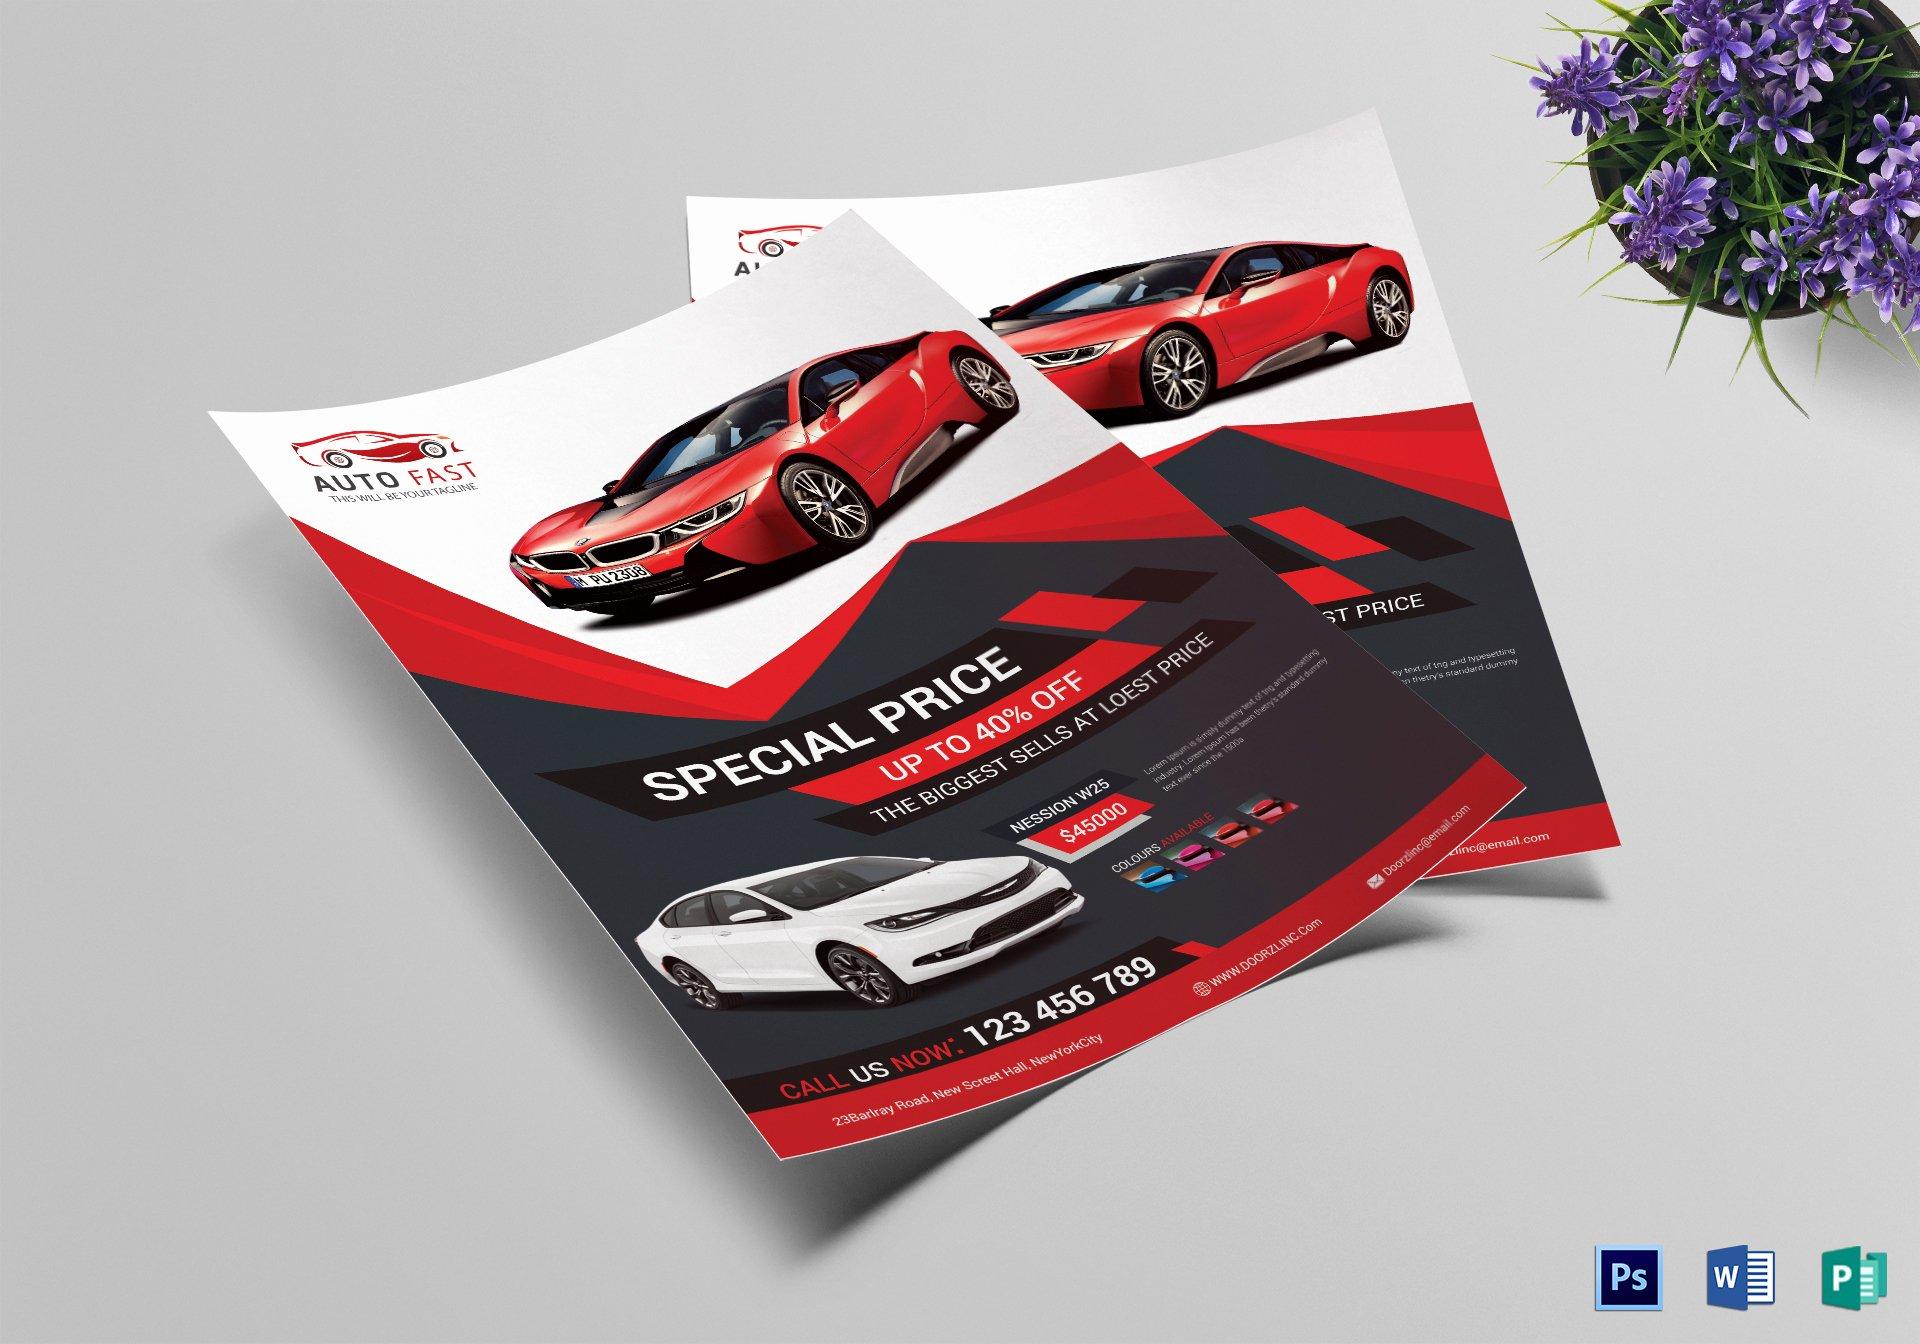 Car for Sale Flyer Template Lovely Elegant Car Sales Flyer Design Template In Word Psd